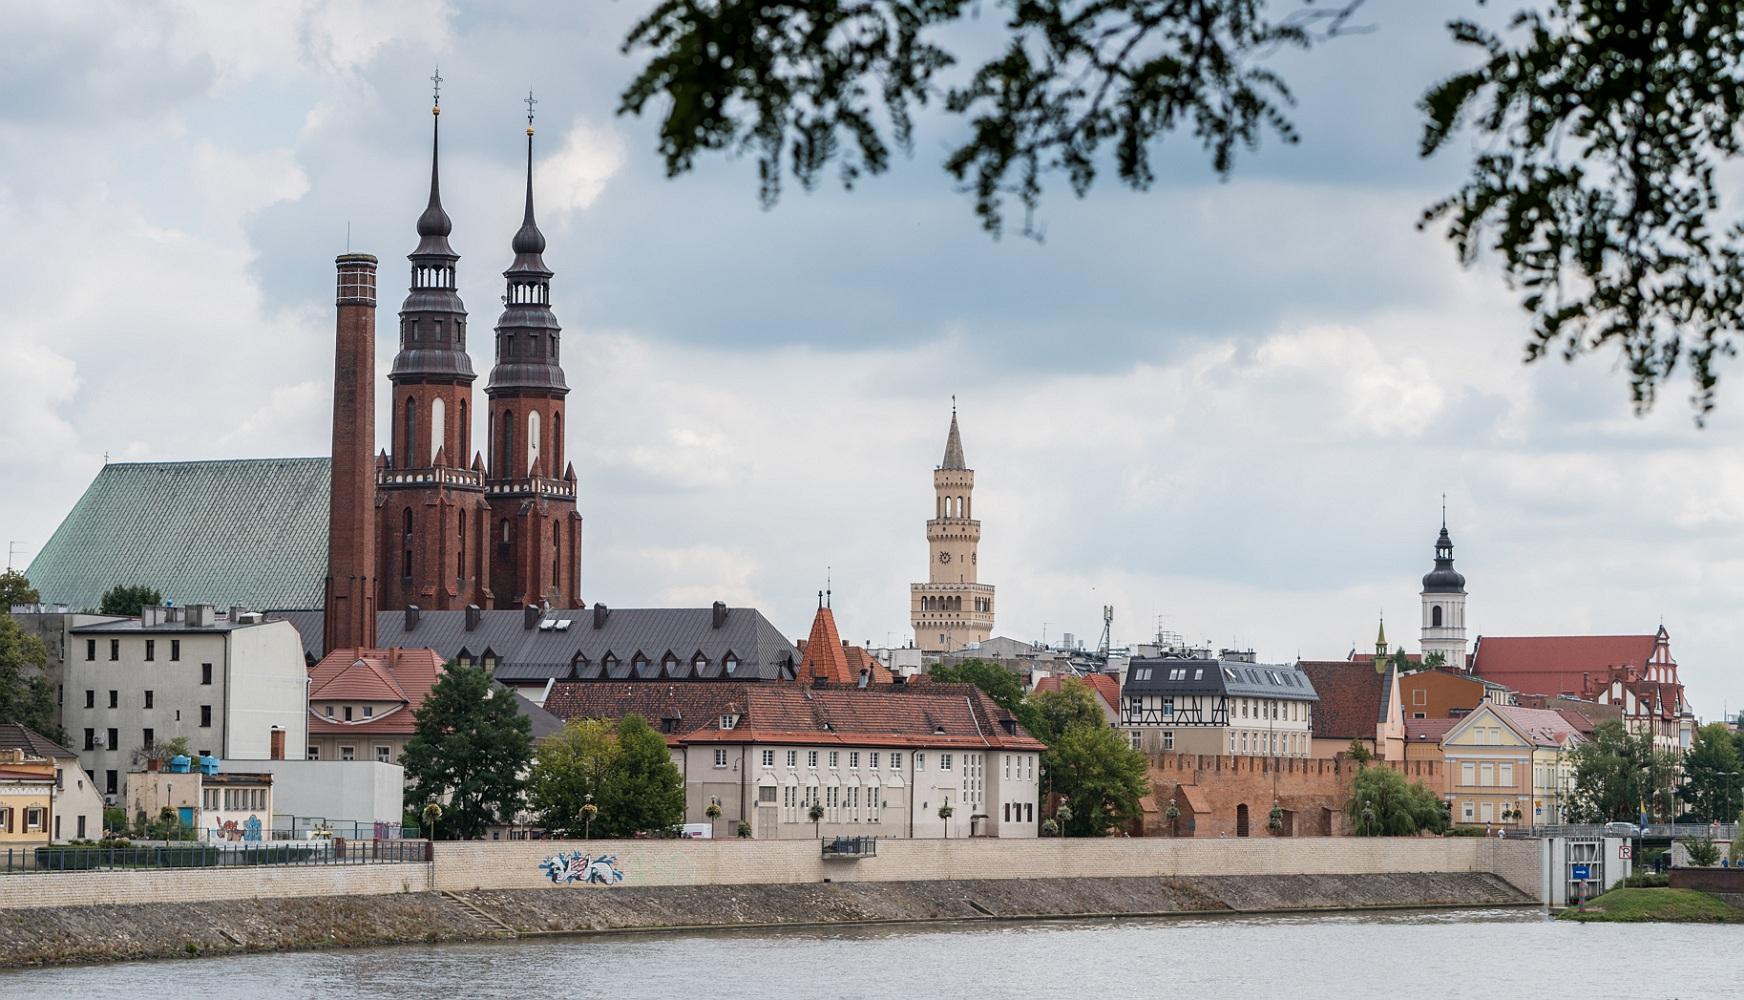 Katedra i Ratusz Opolski